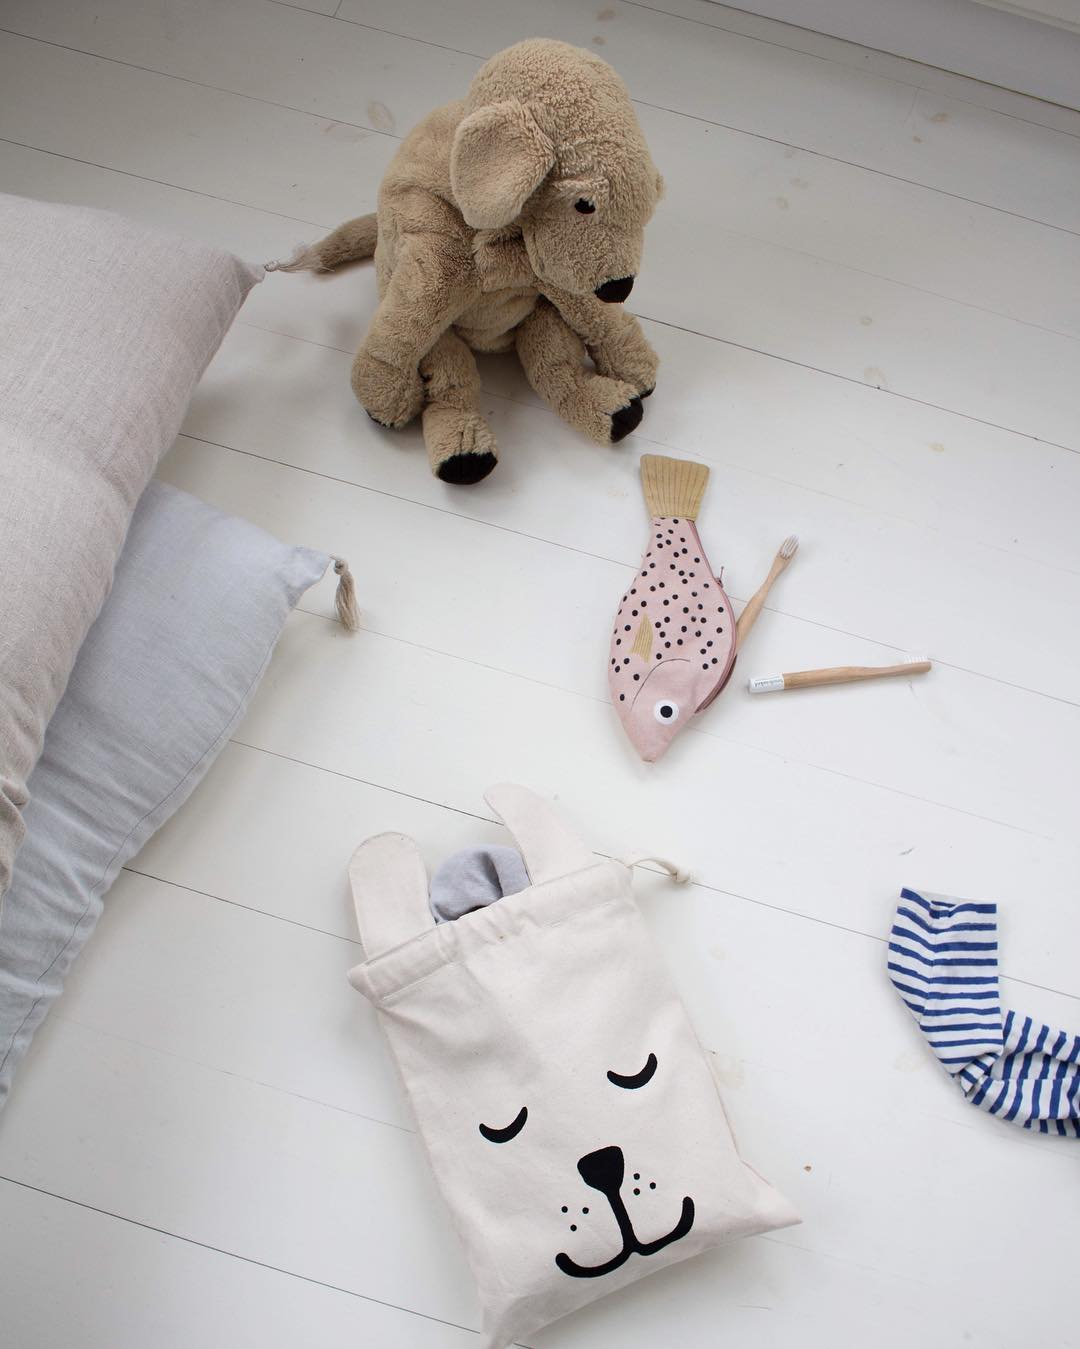 Tellkiddo 瑞典可愛圖案帆布收納袋 小兔兔4